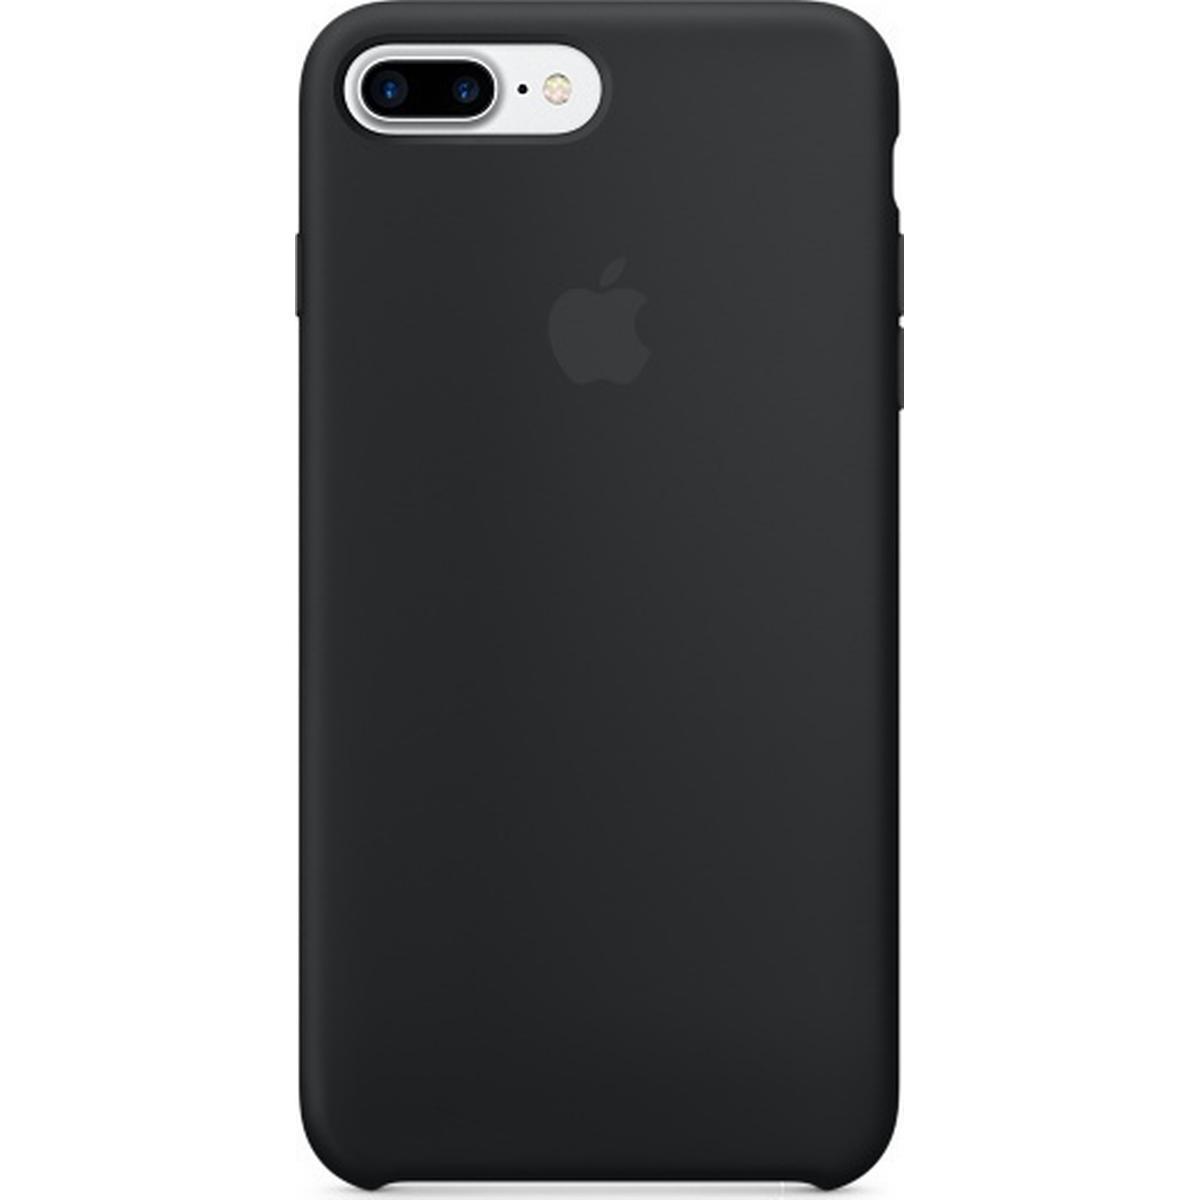 Iphone 8 laddare ???Hitta det lägsta priset hos PriceRunner nu »